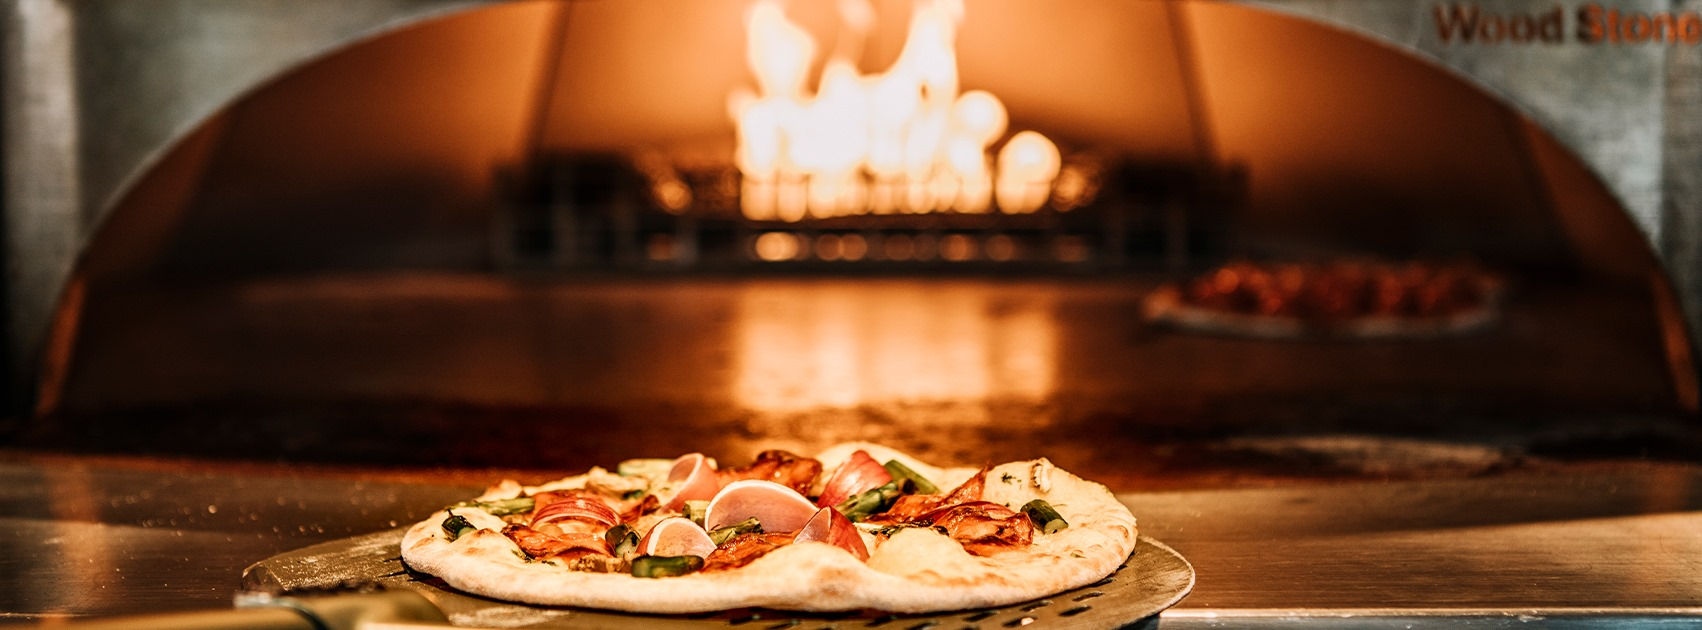 eten en drinken in Almere-Centrum, Woodstone Pizza & Wine